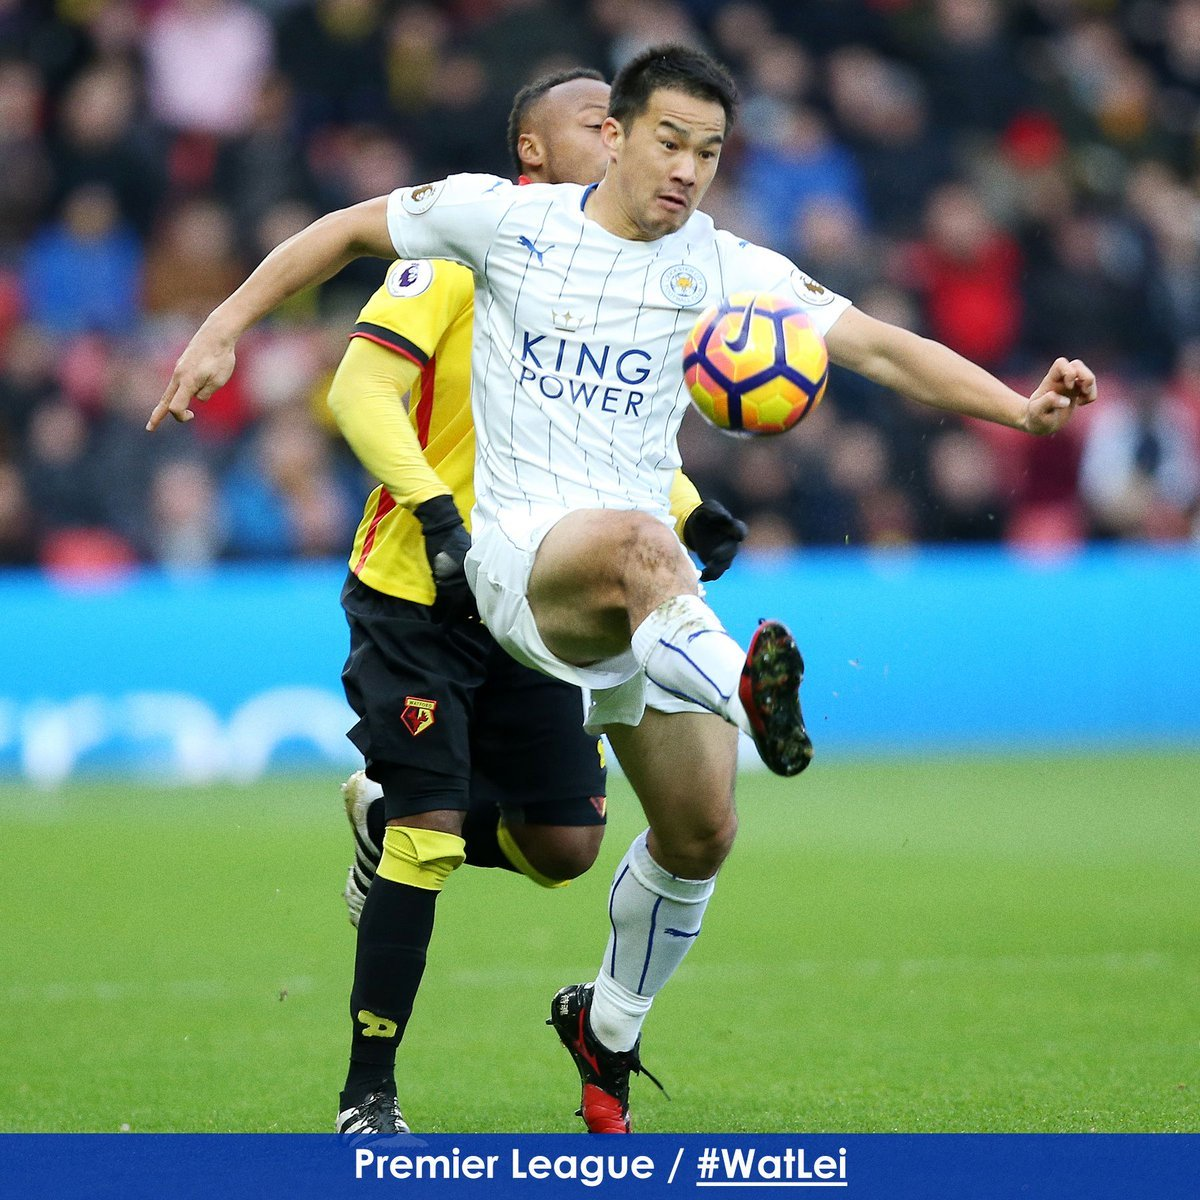 Shinji Okazaki does well to bring the ball down under pressure